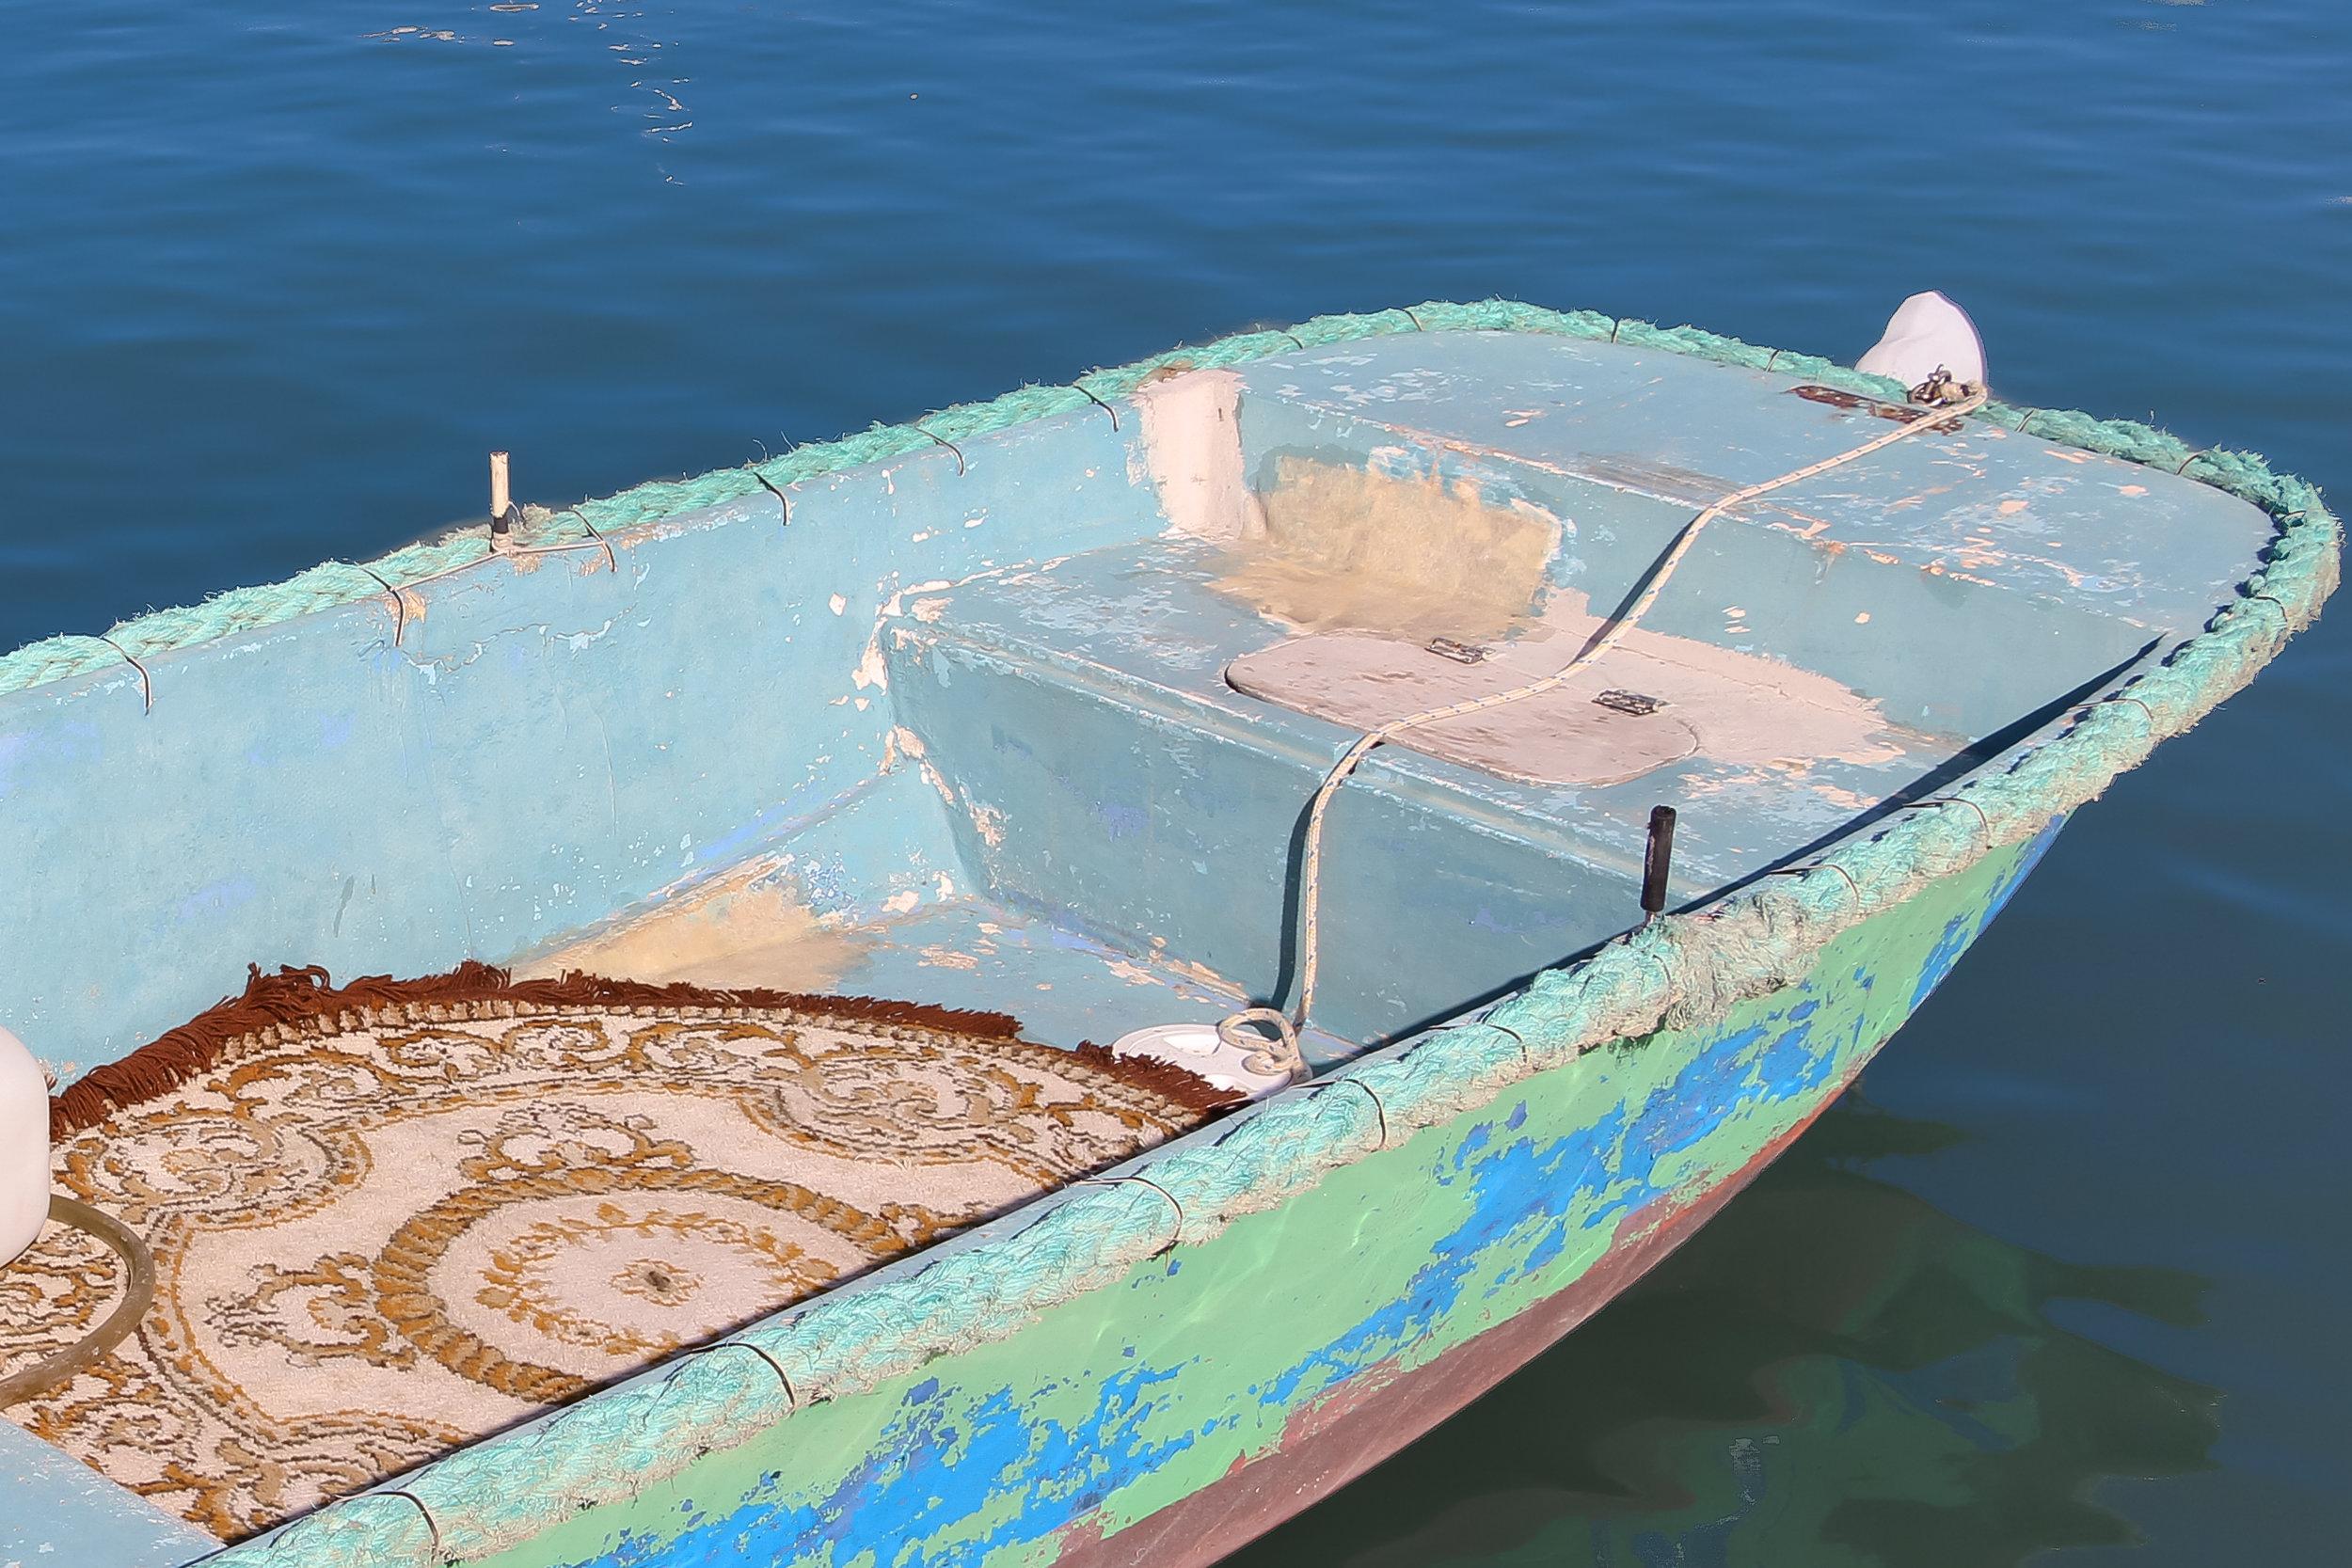 Maltese Boat | Traditional Fishing Village | Mediterranean Sea | Marsaxlokk - Thinking About Appreciation For Quality In Malta | Malta, Europe | DoLessGetMoreDone.com | - Canon Minimal Travel Documentary Photography - search for Liveability | Sustainability